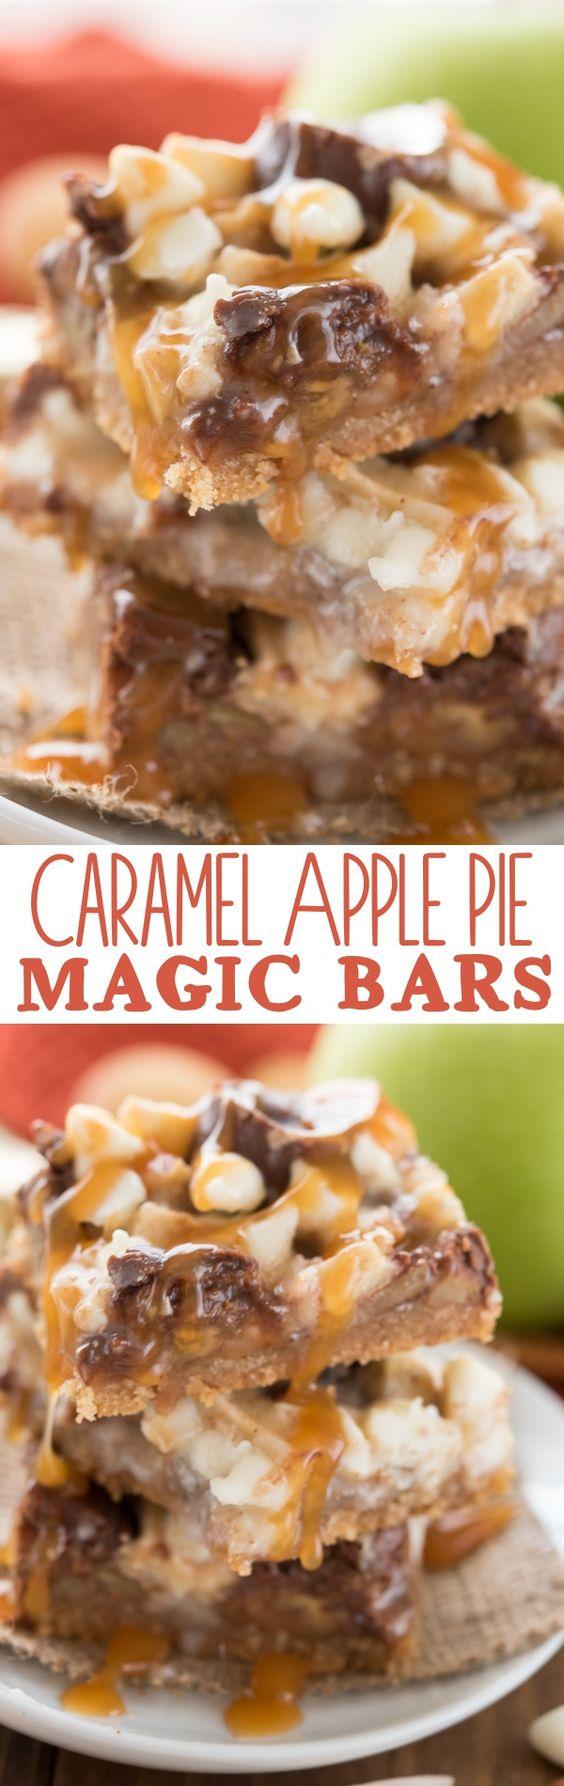 Thanksgiving Desserts: Caramel Apple Pie Magic Bars